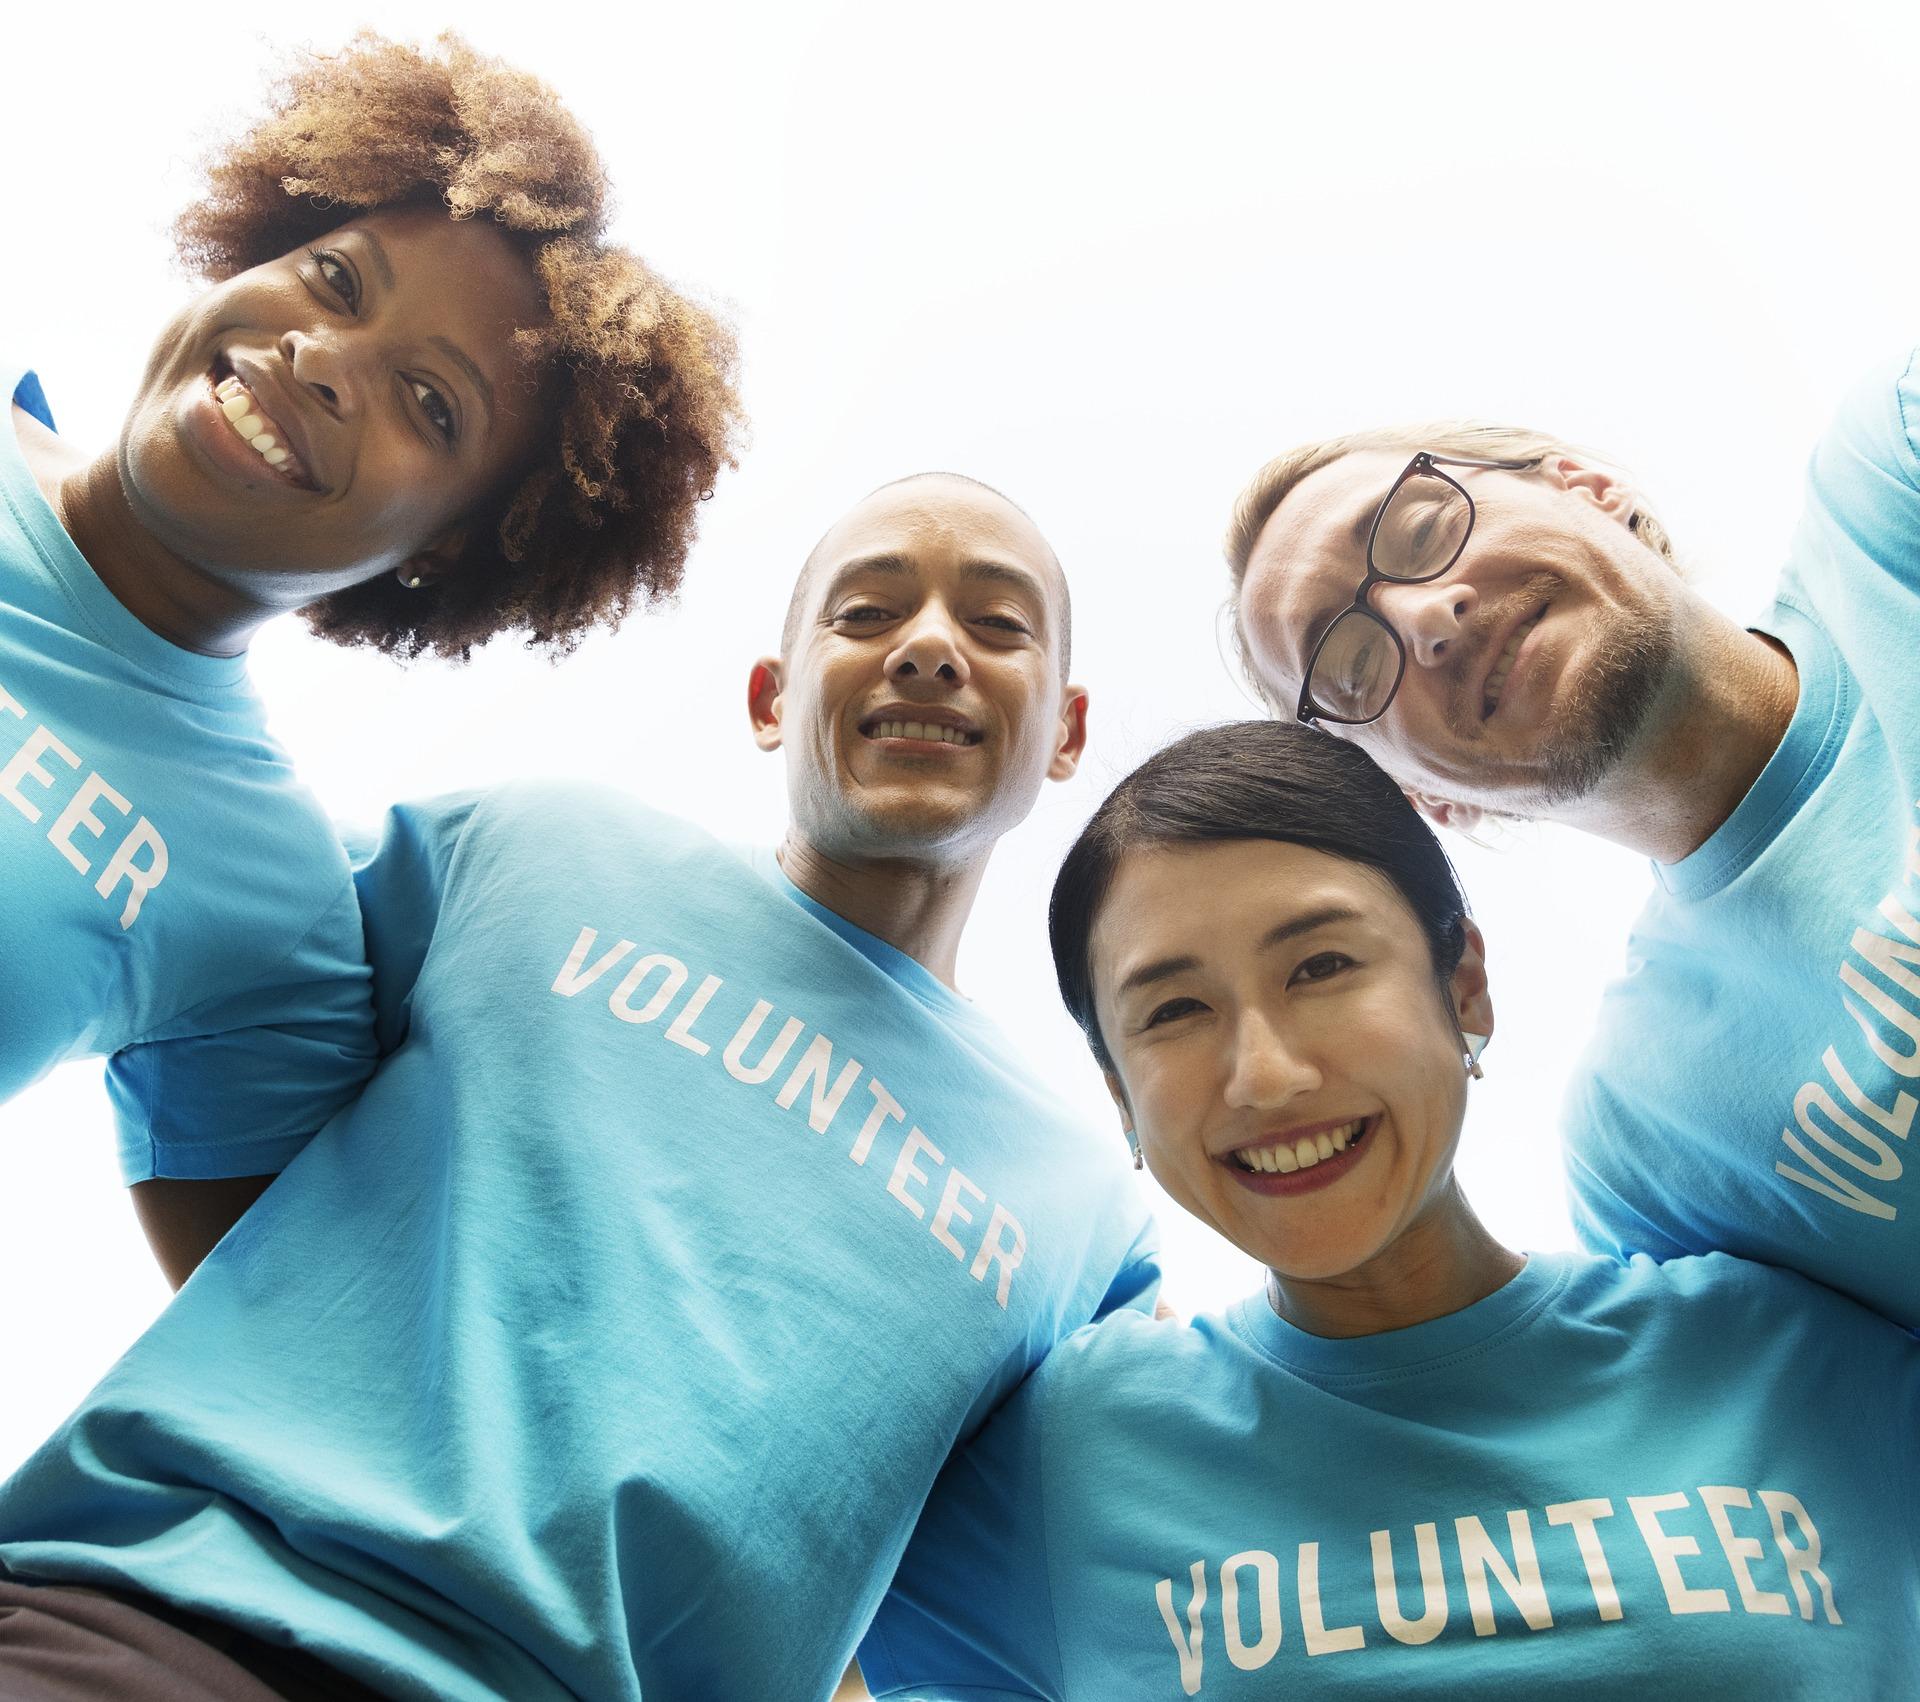 volunteer-3980607_1920-1